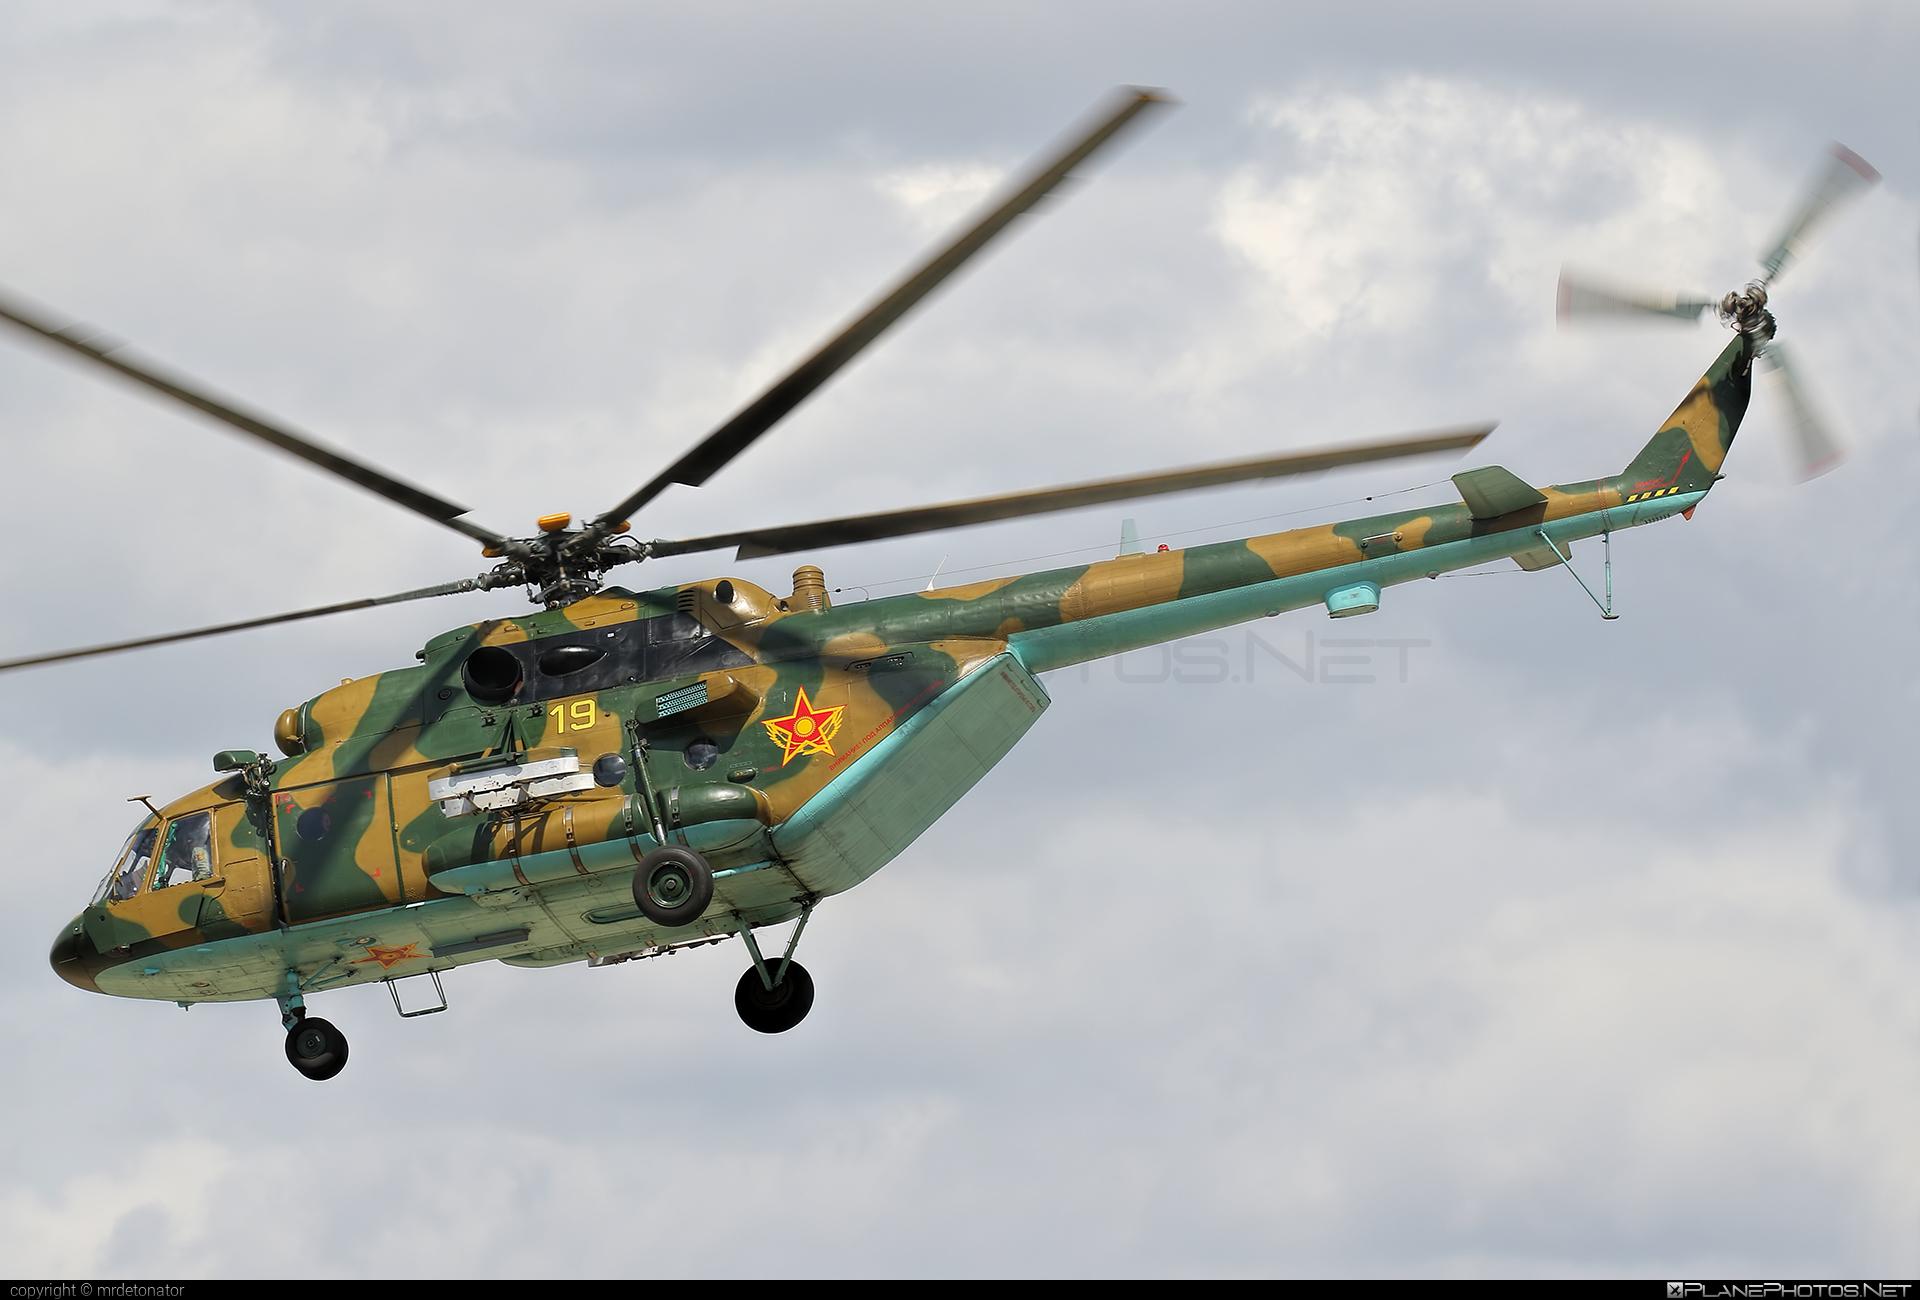 Mil Mi-17V-5 - 19 operated by Kazakhstan Air Defence Force #mi17 #mi17v5 #mil #mil17 #milhelicopters